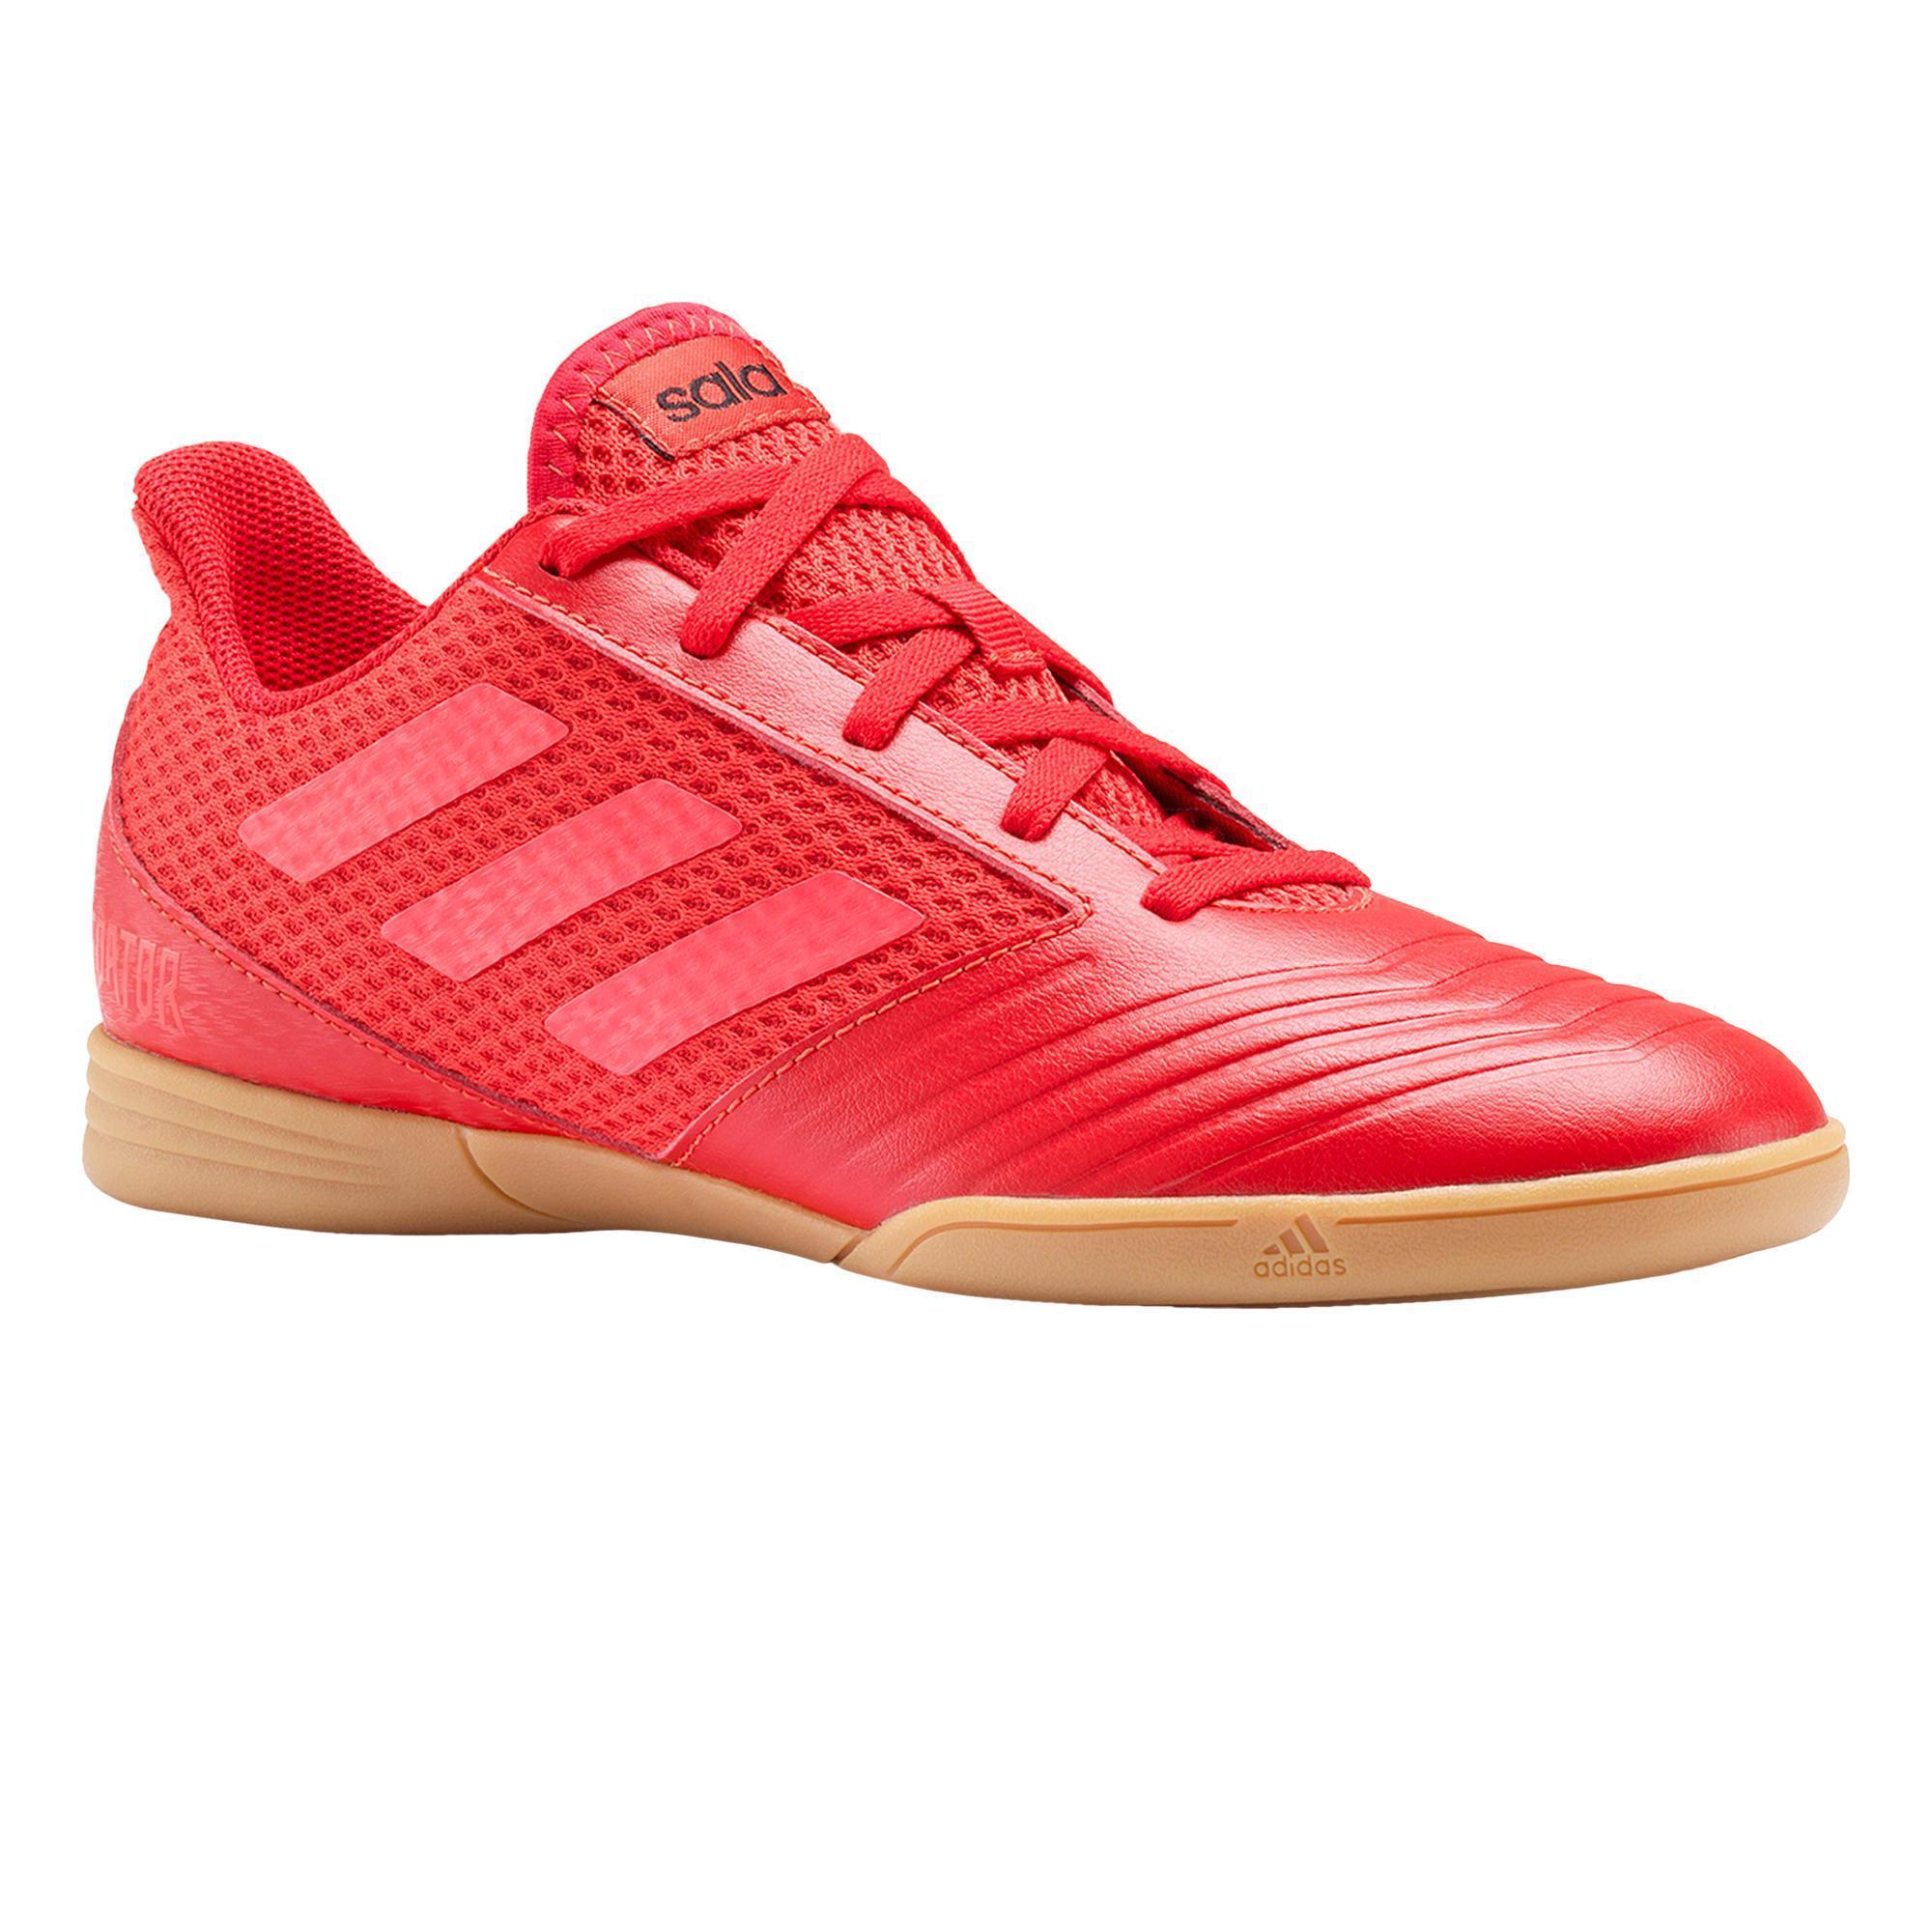 sports shoes 6c7b1 063ba Zaalvoetbalschoenen kopen online  DECATHLON  Nergens goedkop